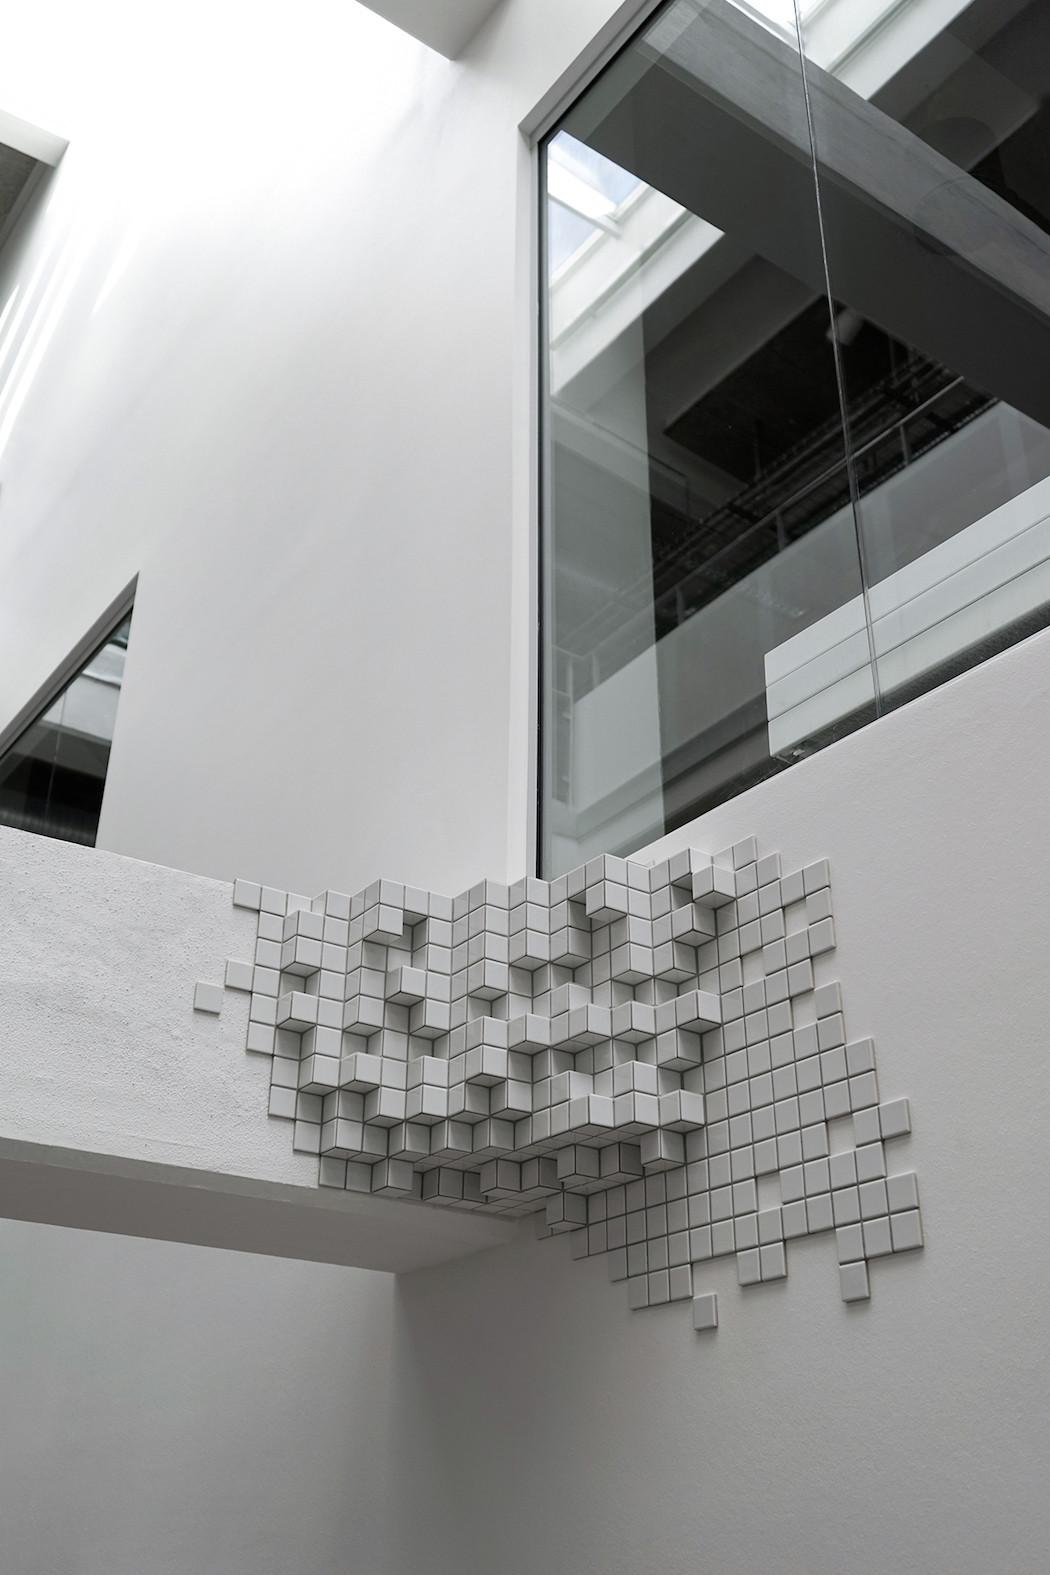 art_borgmannlenk_mos_installation_12-1050x1575